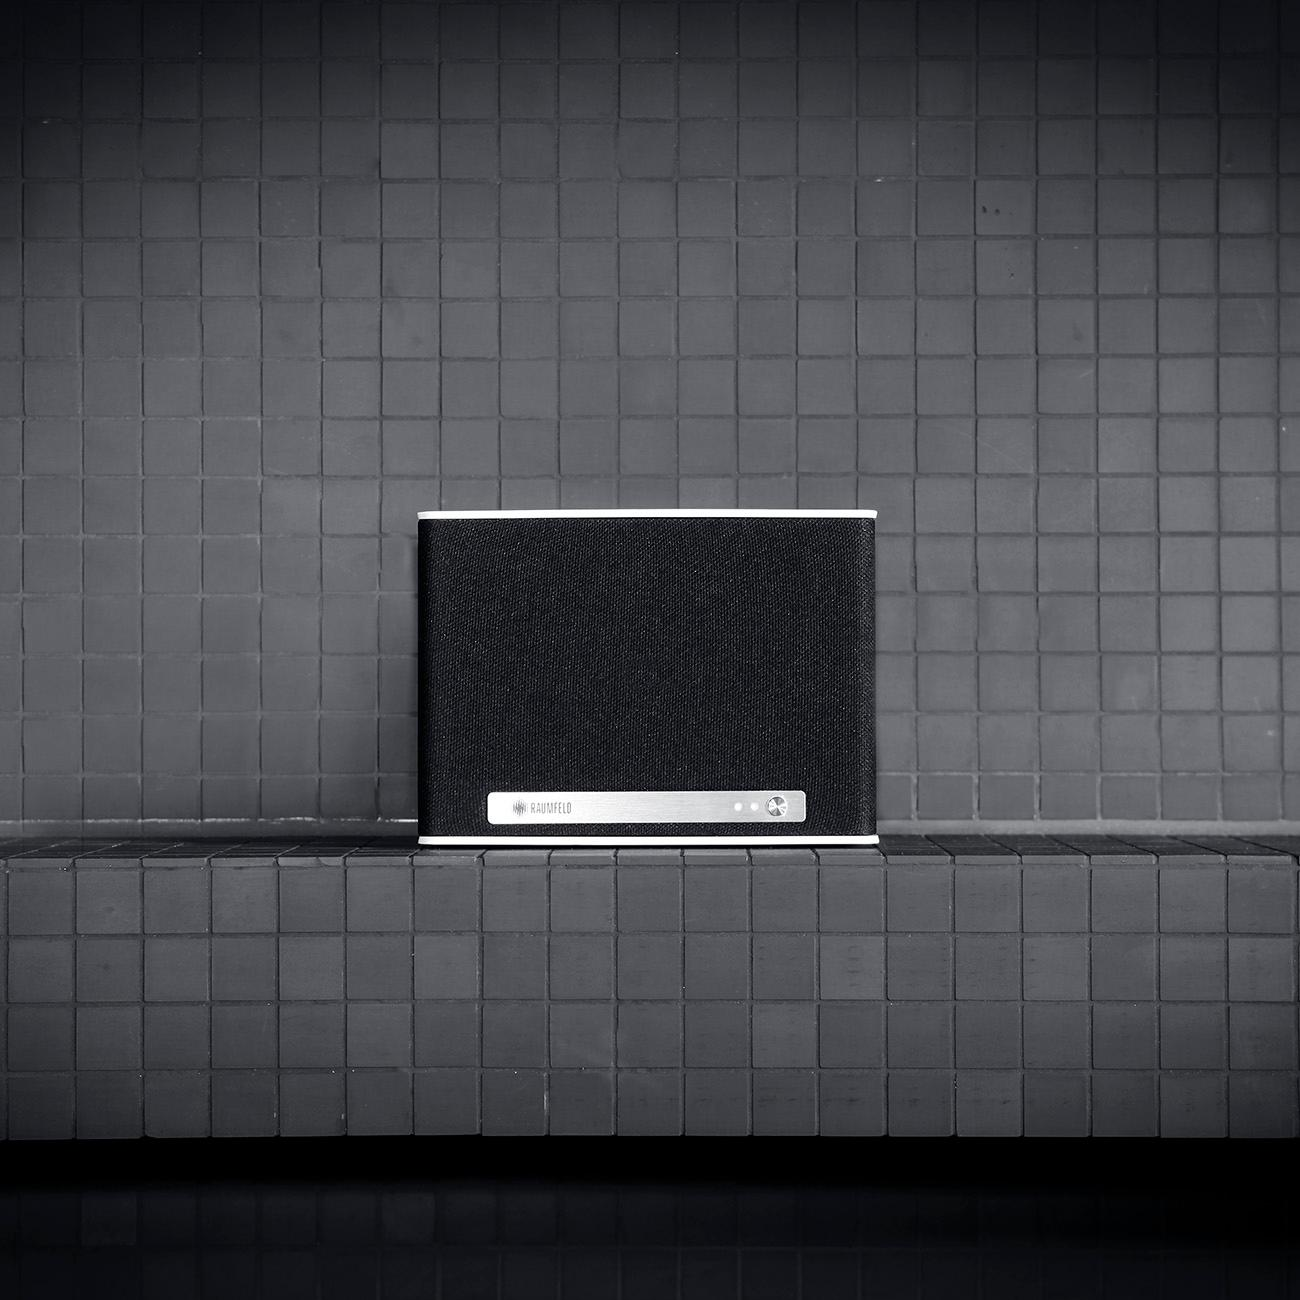 raumfeld one s mini wlan lautsprecher wei streaming wlan spotify kabellos multiroom app. Black Bedroom Furniture Sets. Home Design Ideas